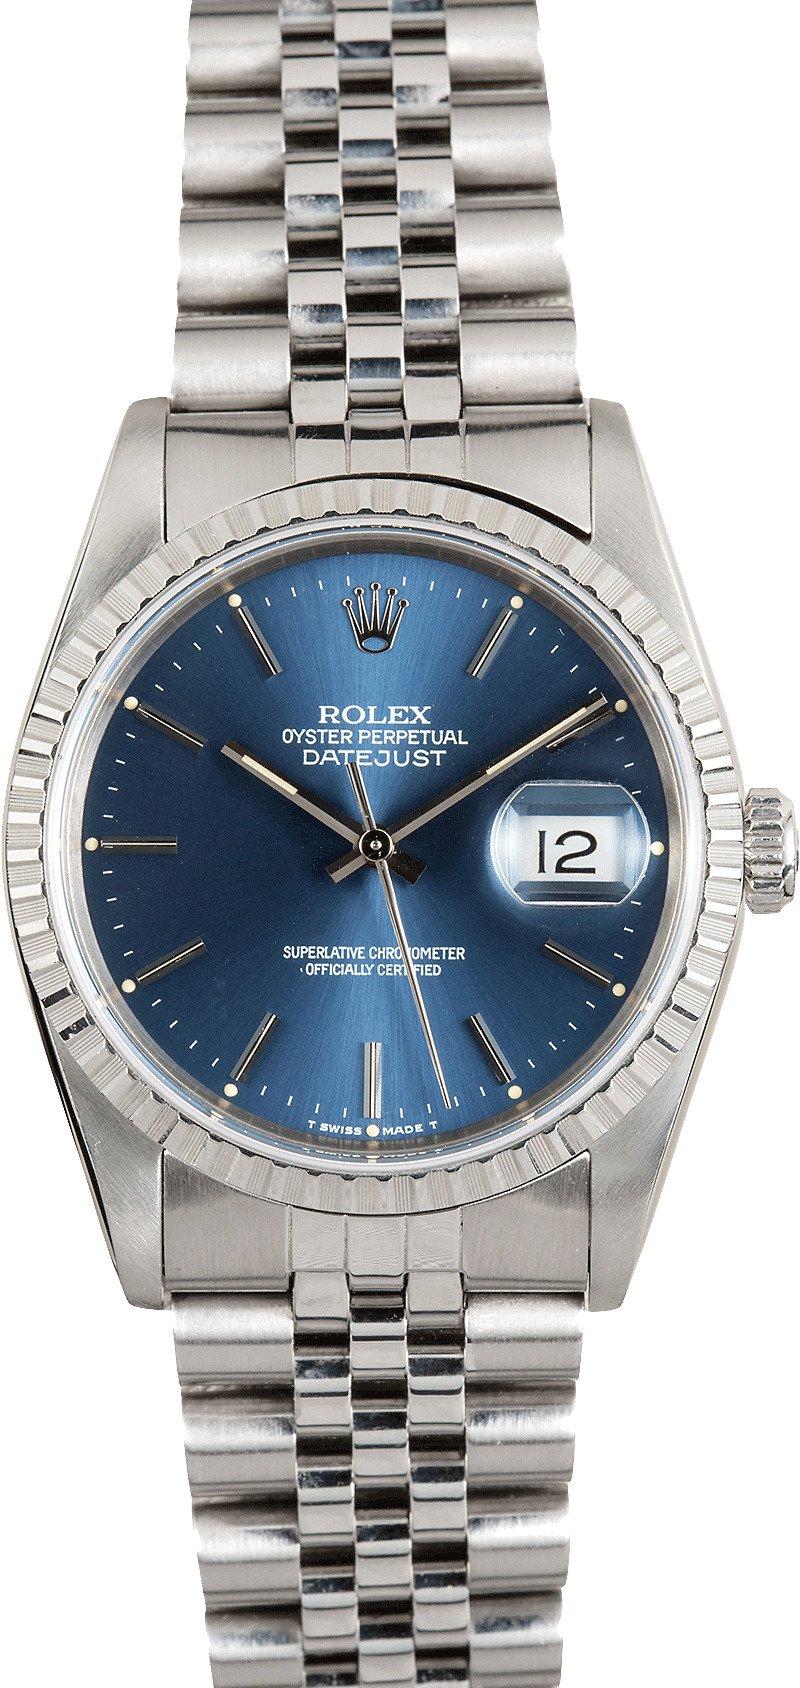 rolex oyster perpetual datejust 16220 blue. Black Bedroom Furniture Sets. Home Design Ideas